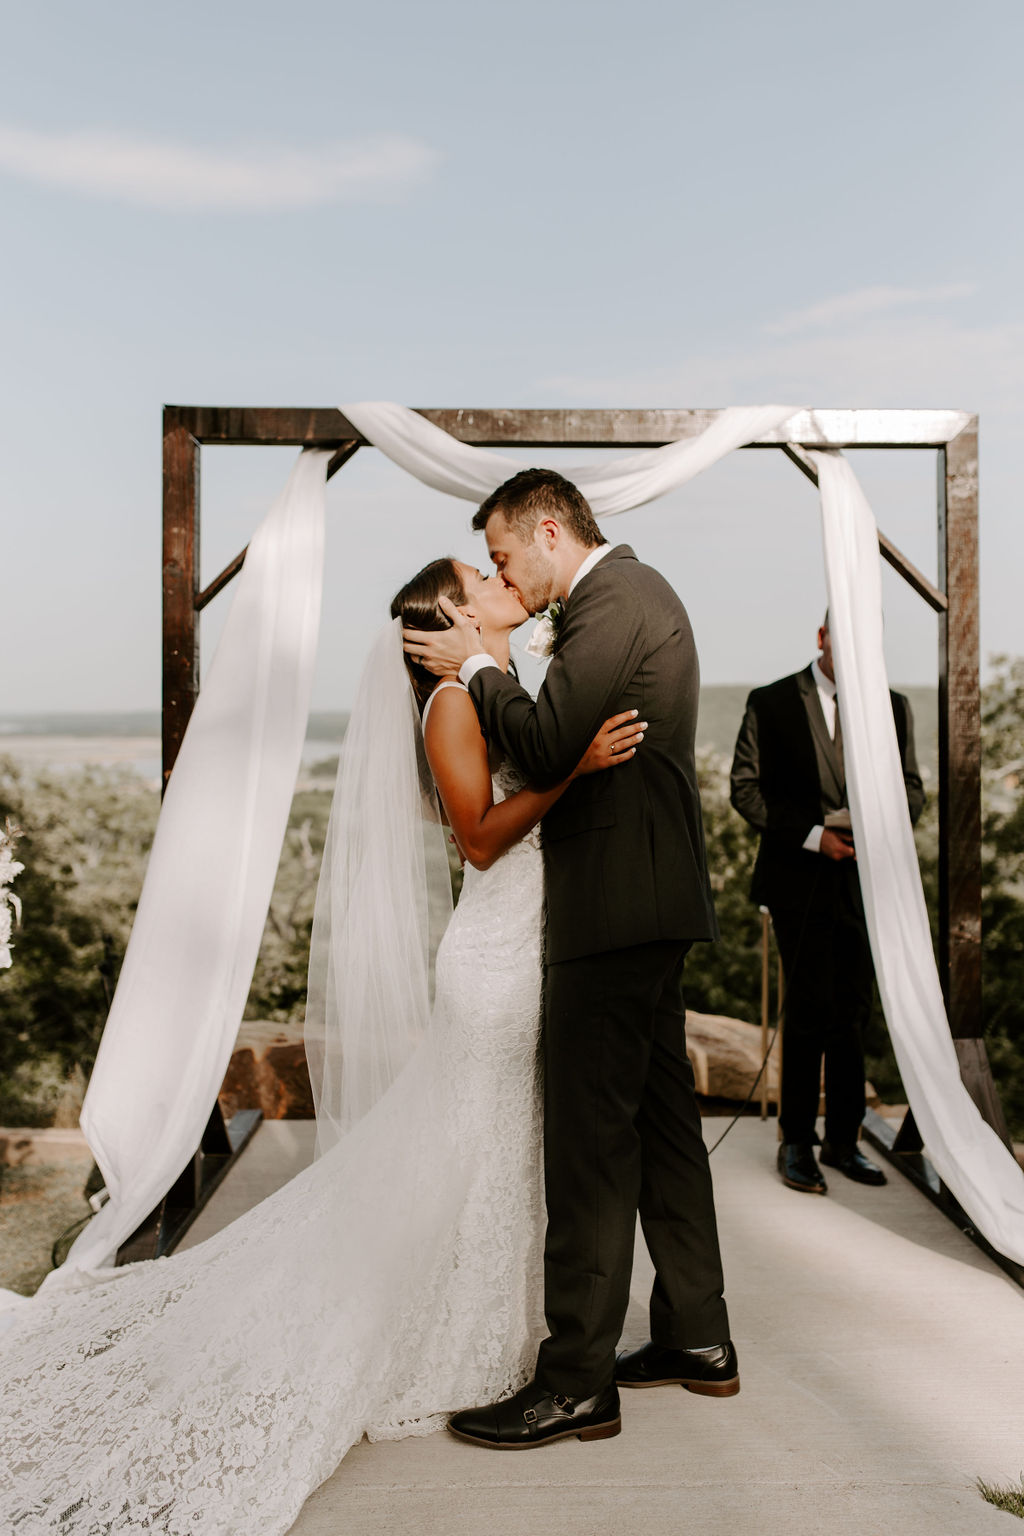 Tulsa White Barn Wedding Venue Outdoor Ceremony 77.jpg